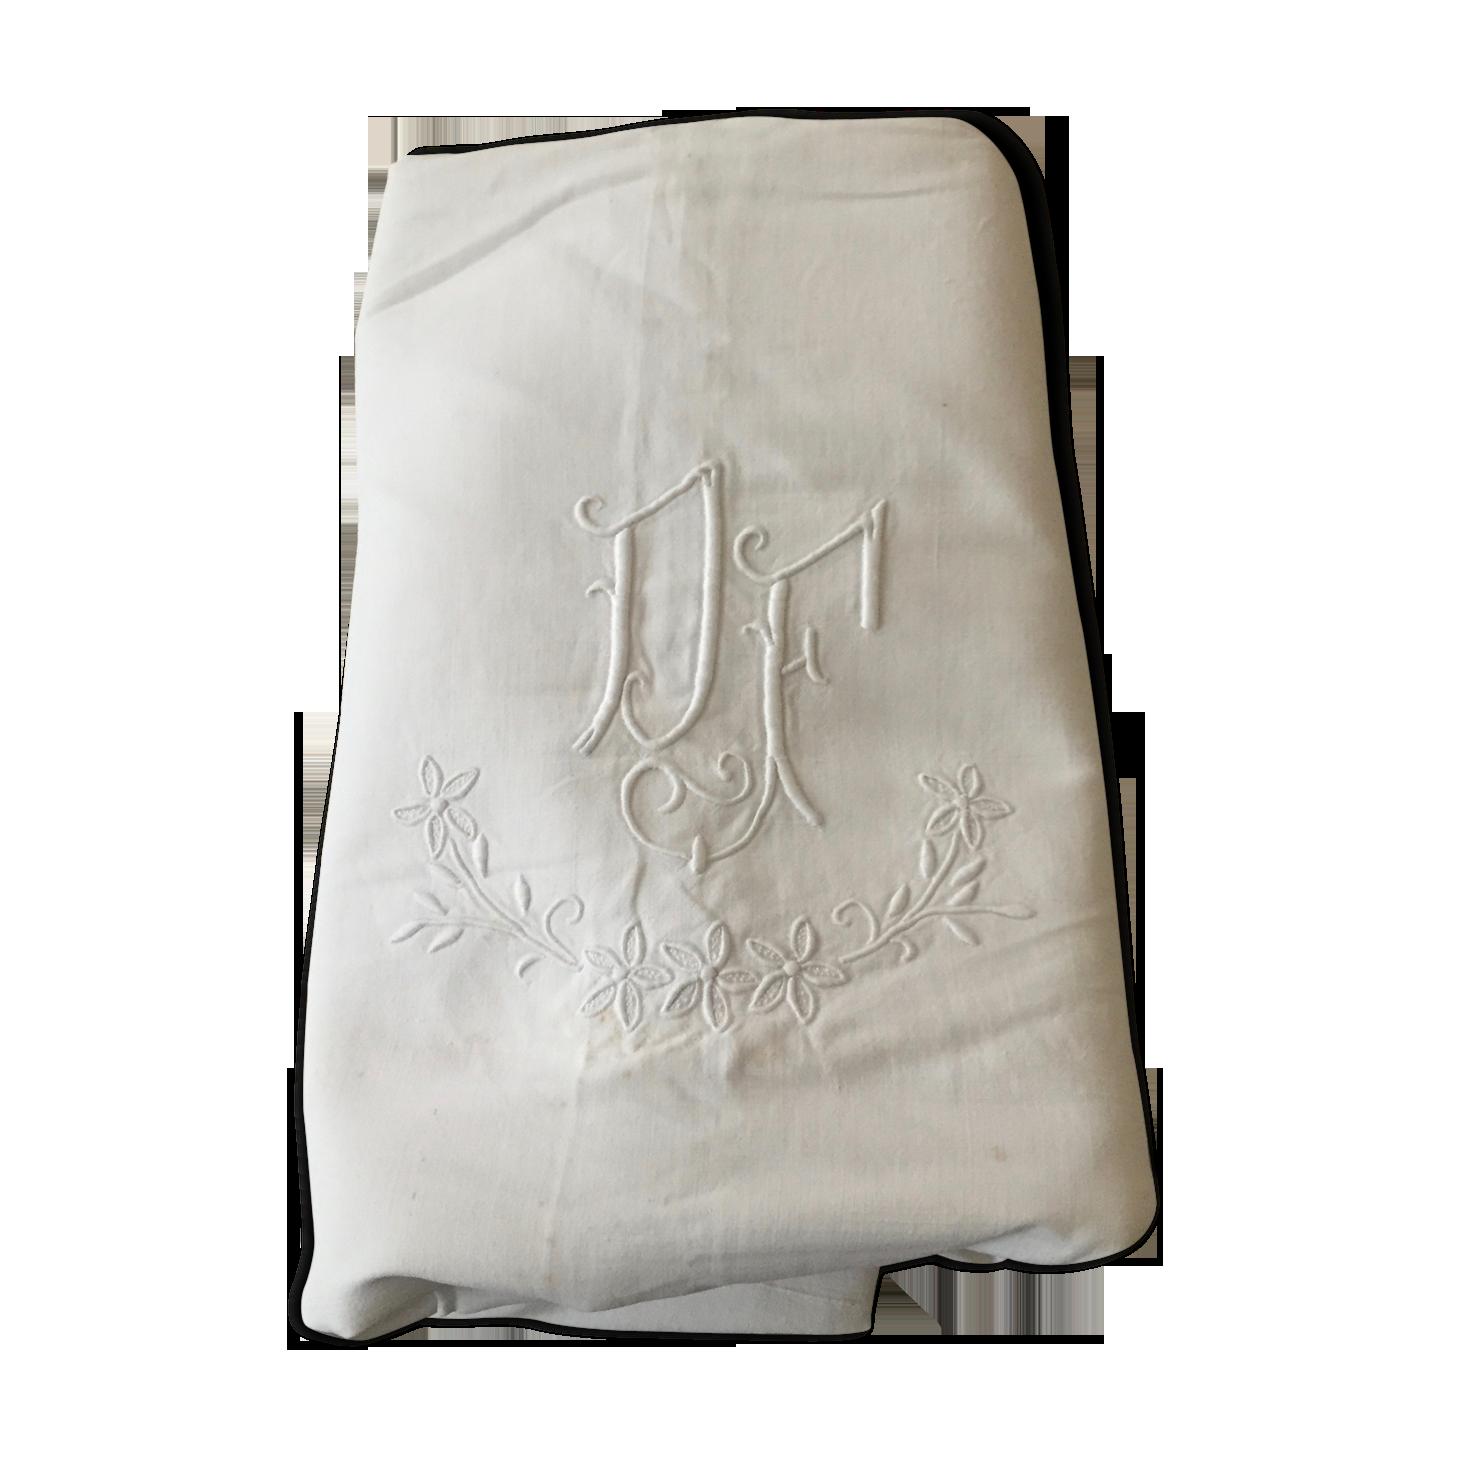 Drap ancien brodé monogramme DF - tissu -